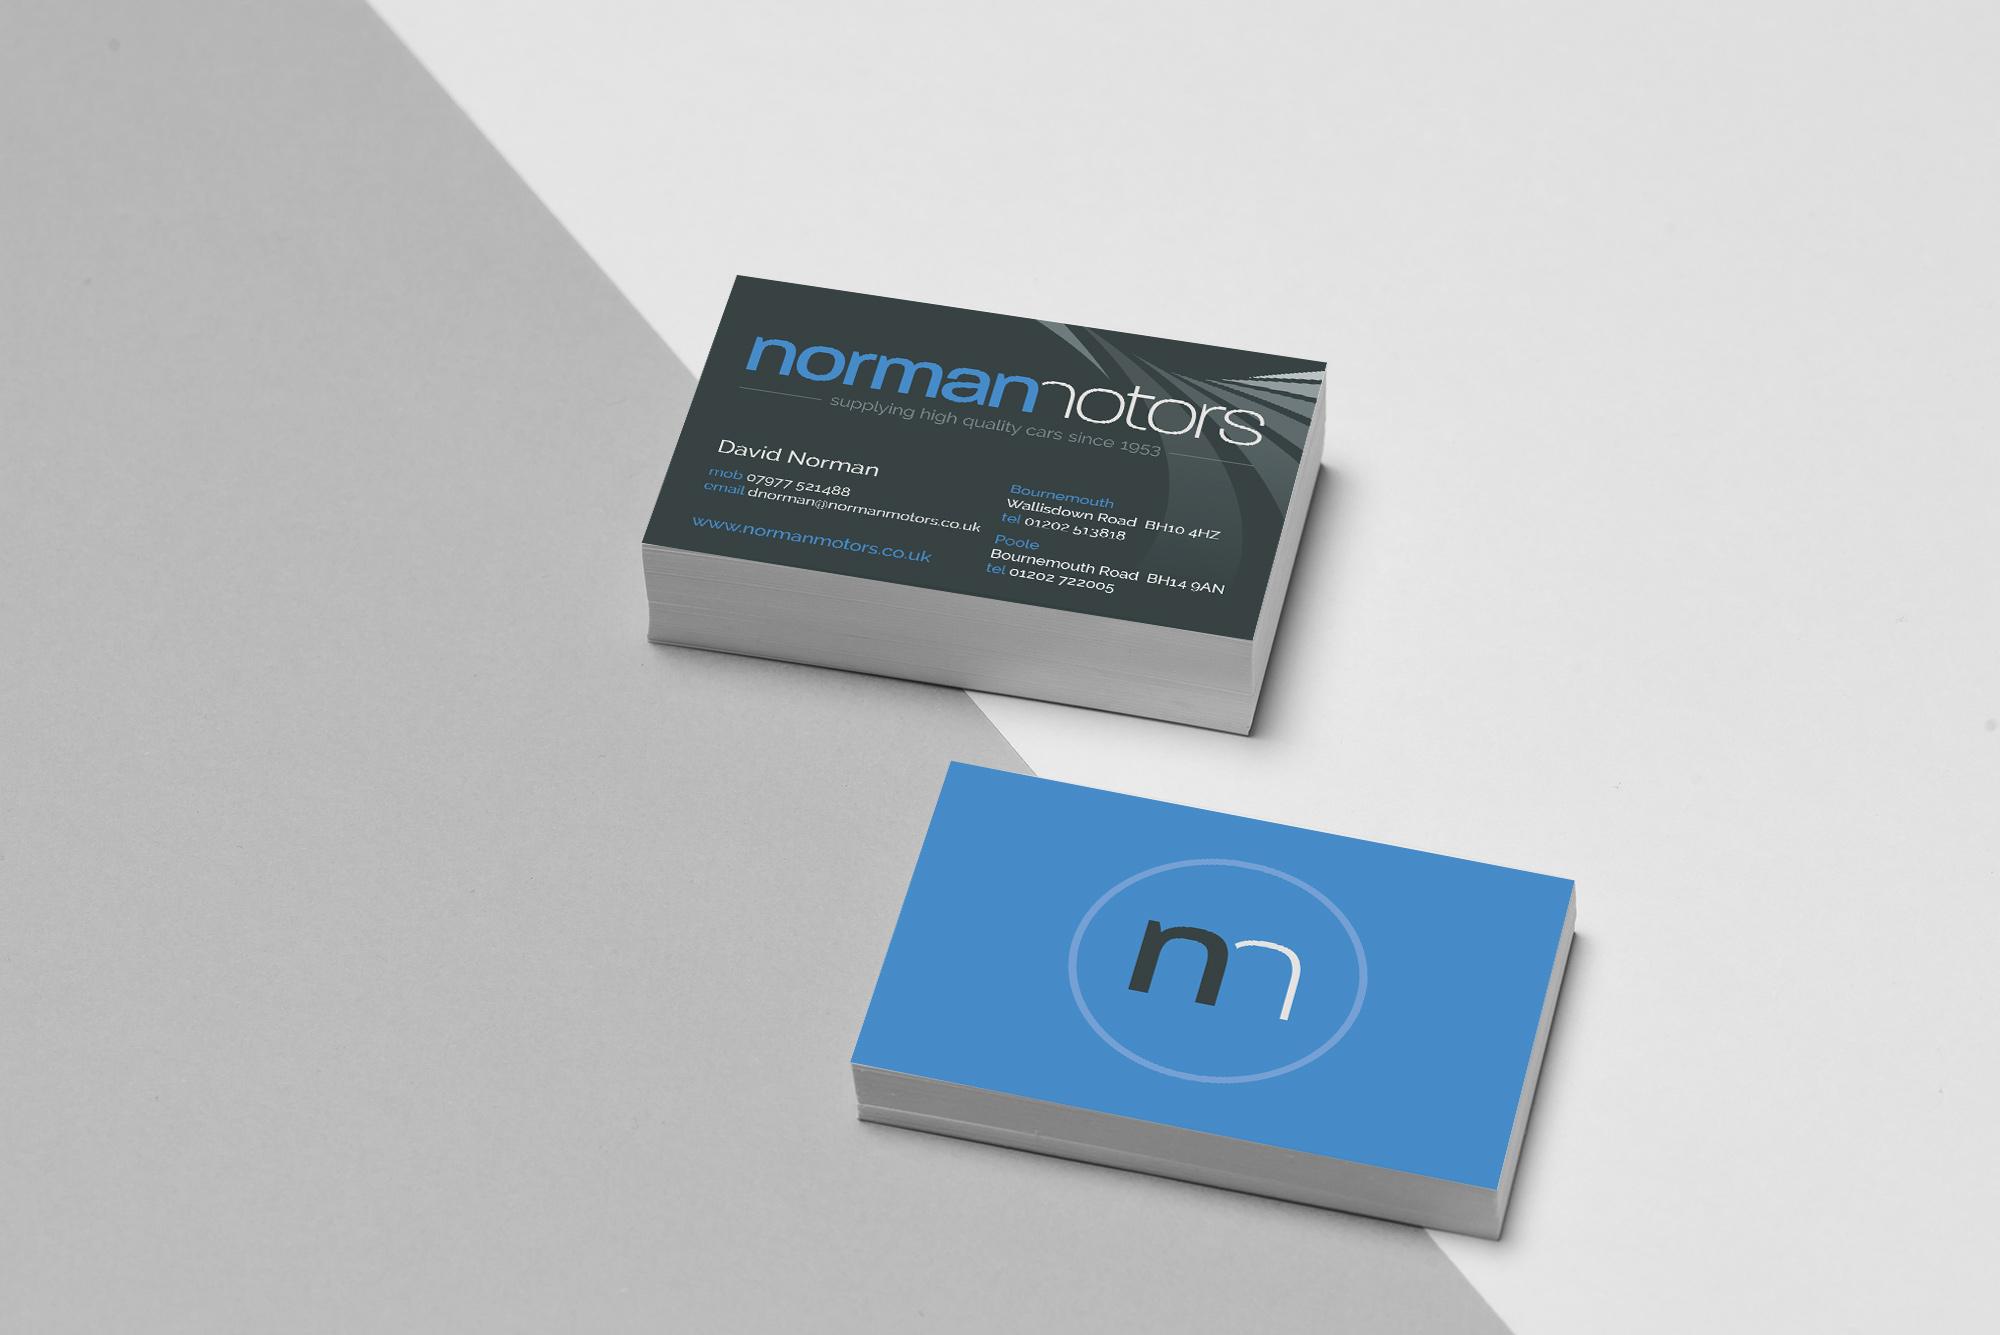 norman-motors-business-cards.jpg